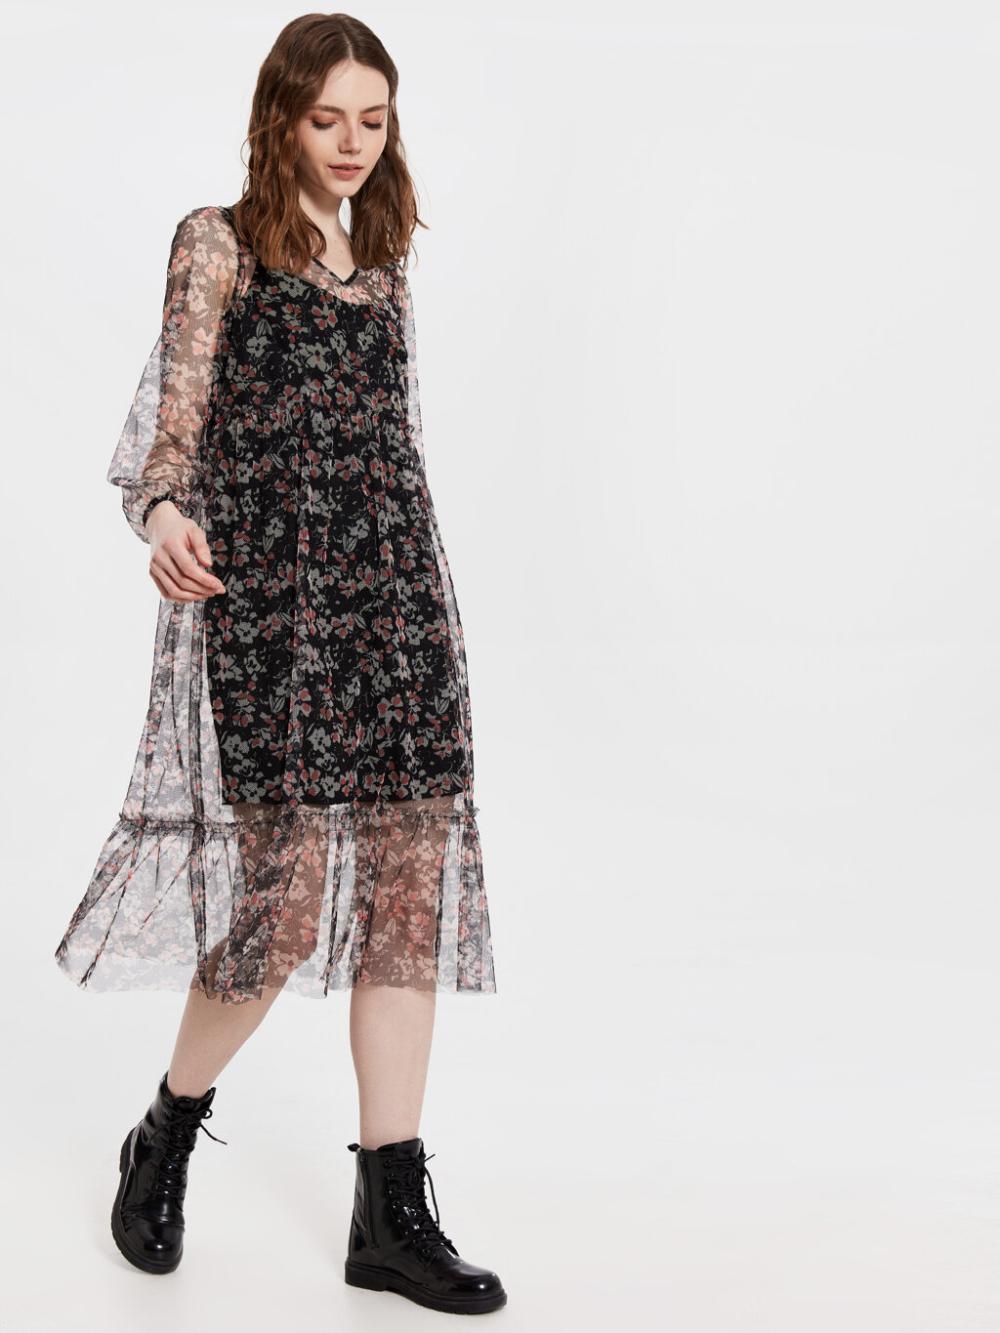 Siyah Cicek Desenli Sifon Elbise Lc Waikiki In 2020 Fashion Flapper Dress Dresses